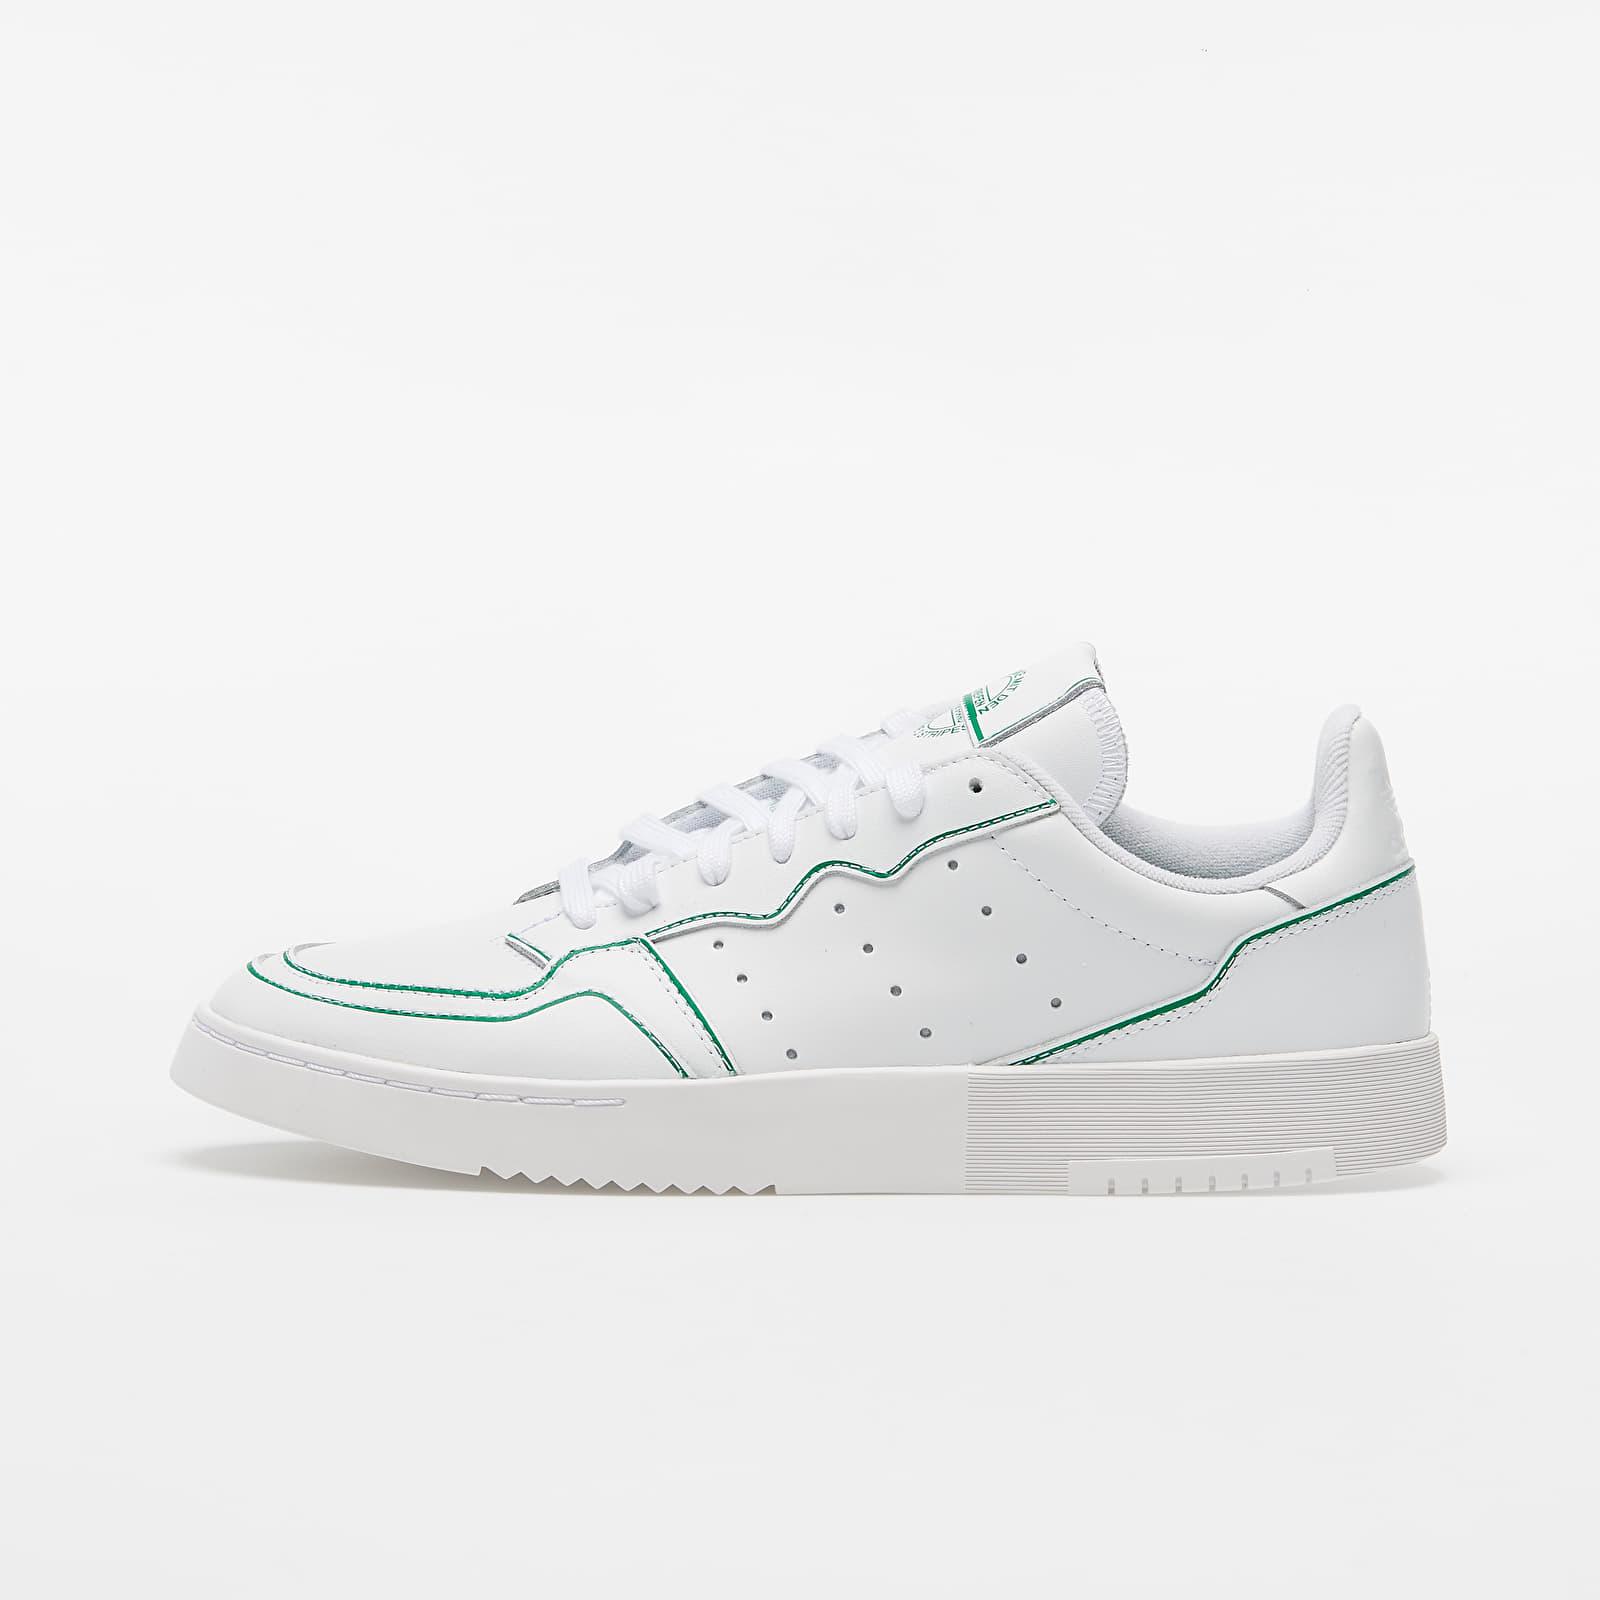 adidas Supercourt Ftw White/ Ftw White/ Green EUR 39 1/3